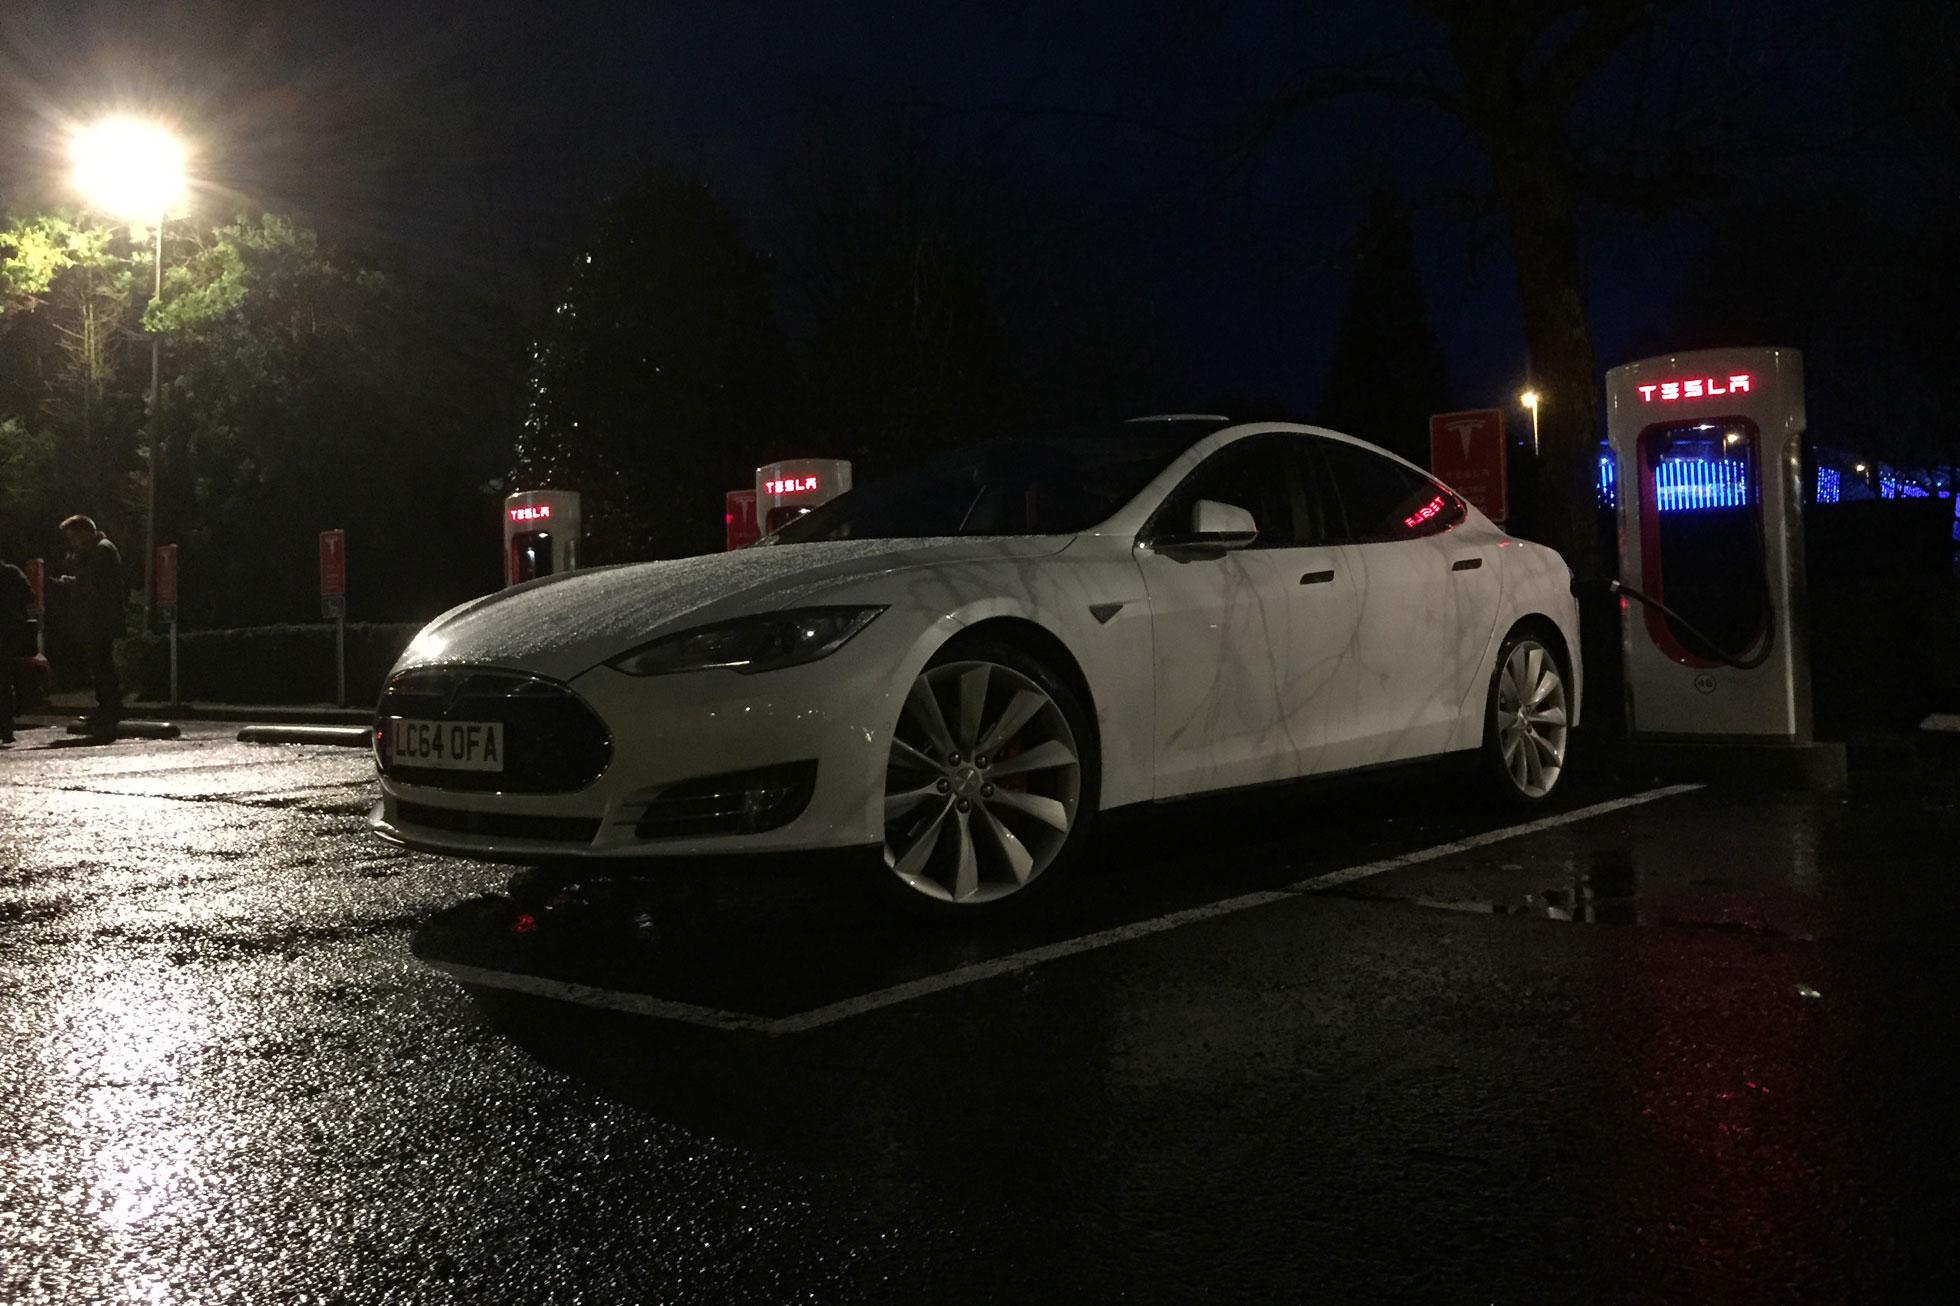 29_Tesla_Model_S_Motoring Research